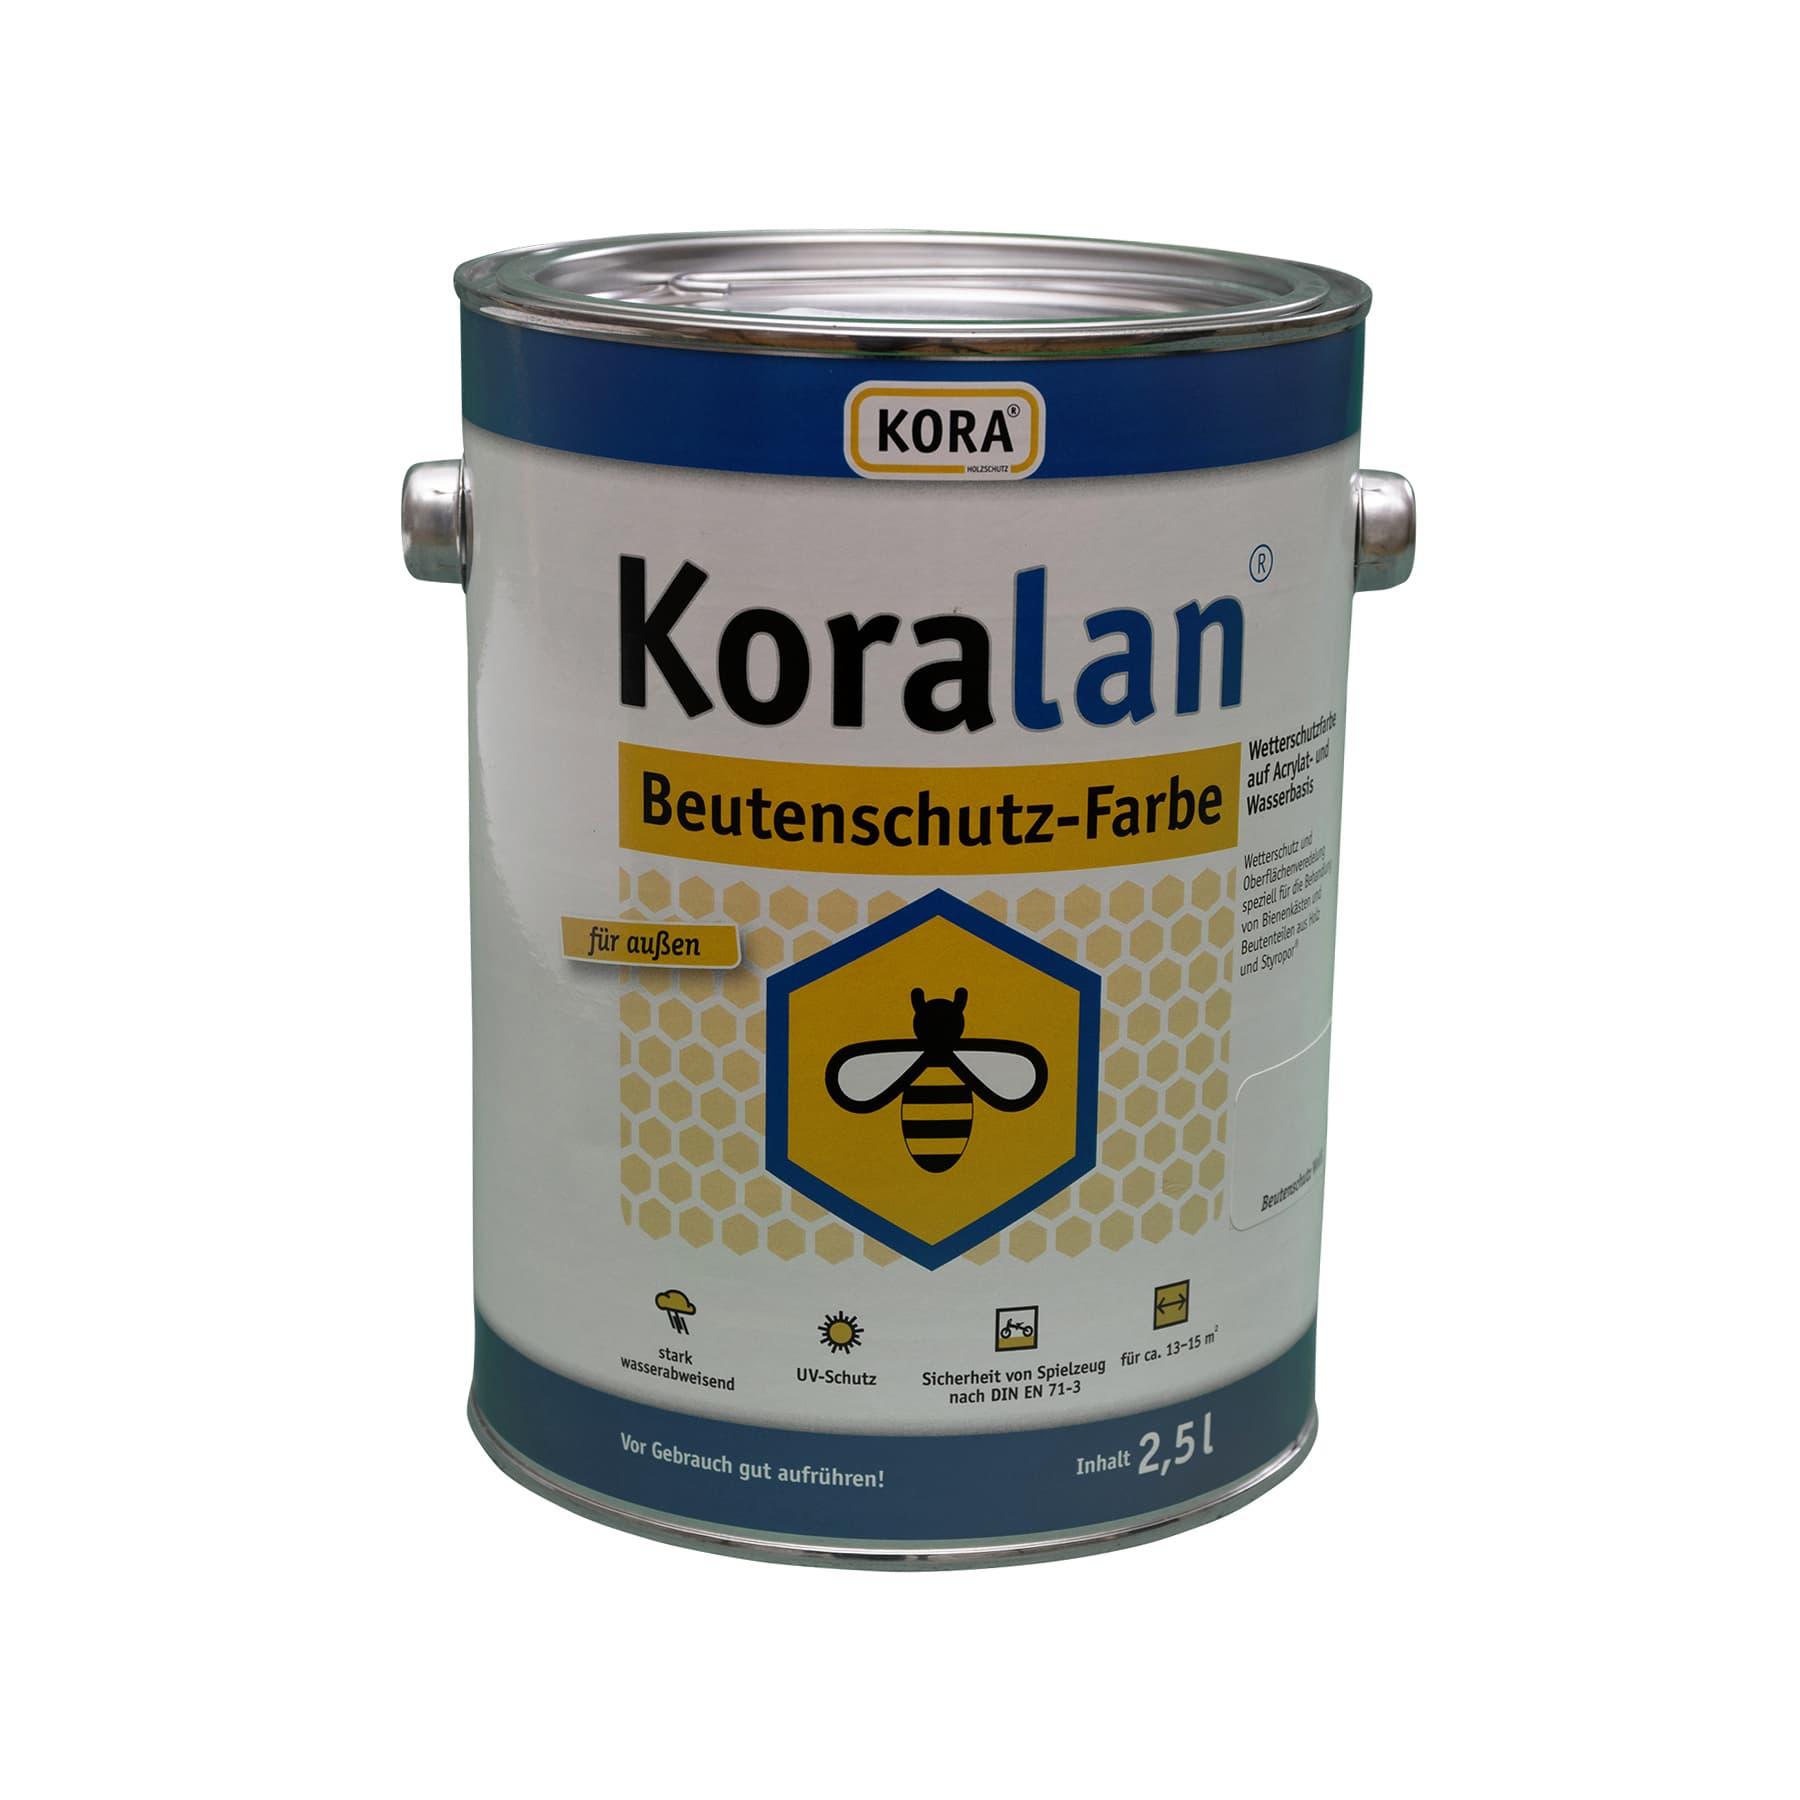 Koralan Beutenschutzfarbe braun 2,5 l